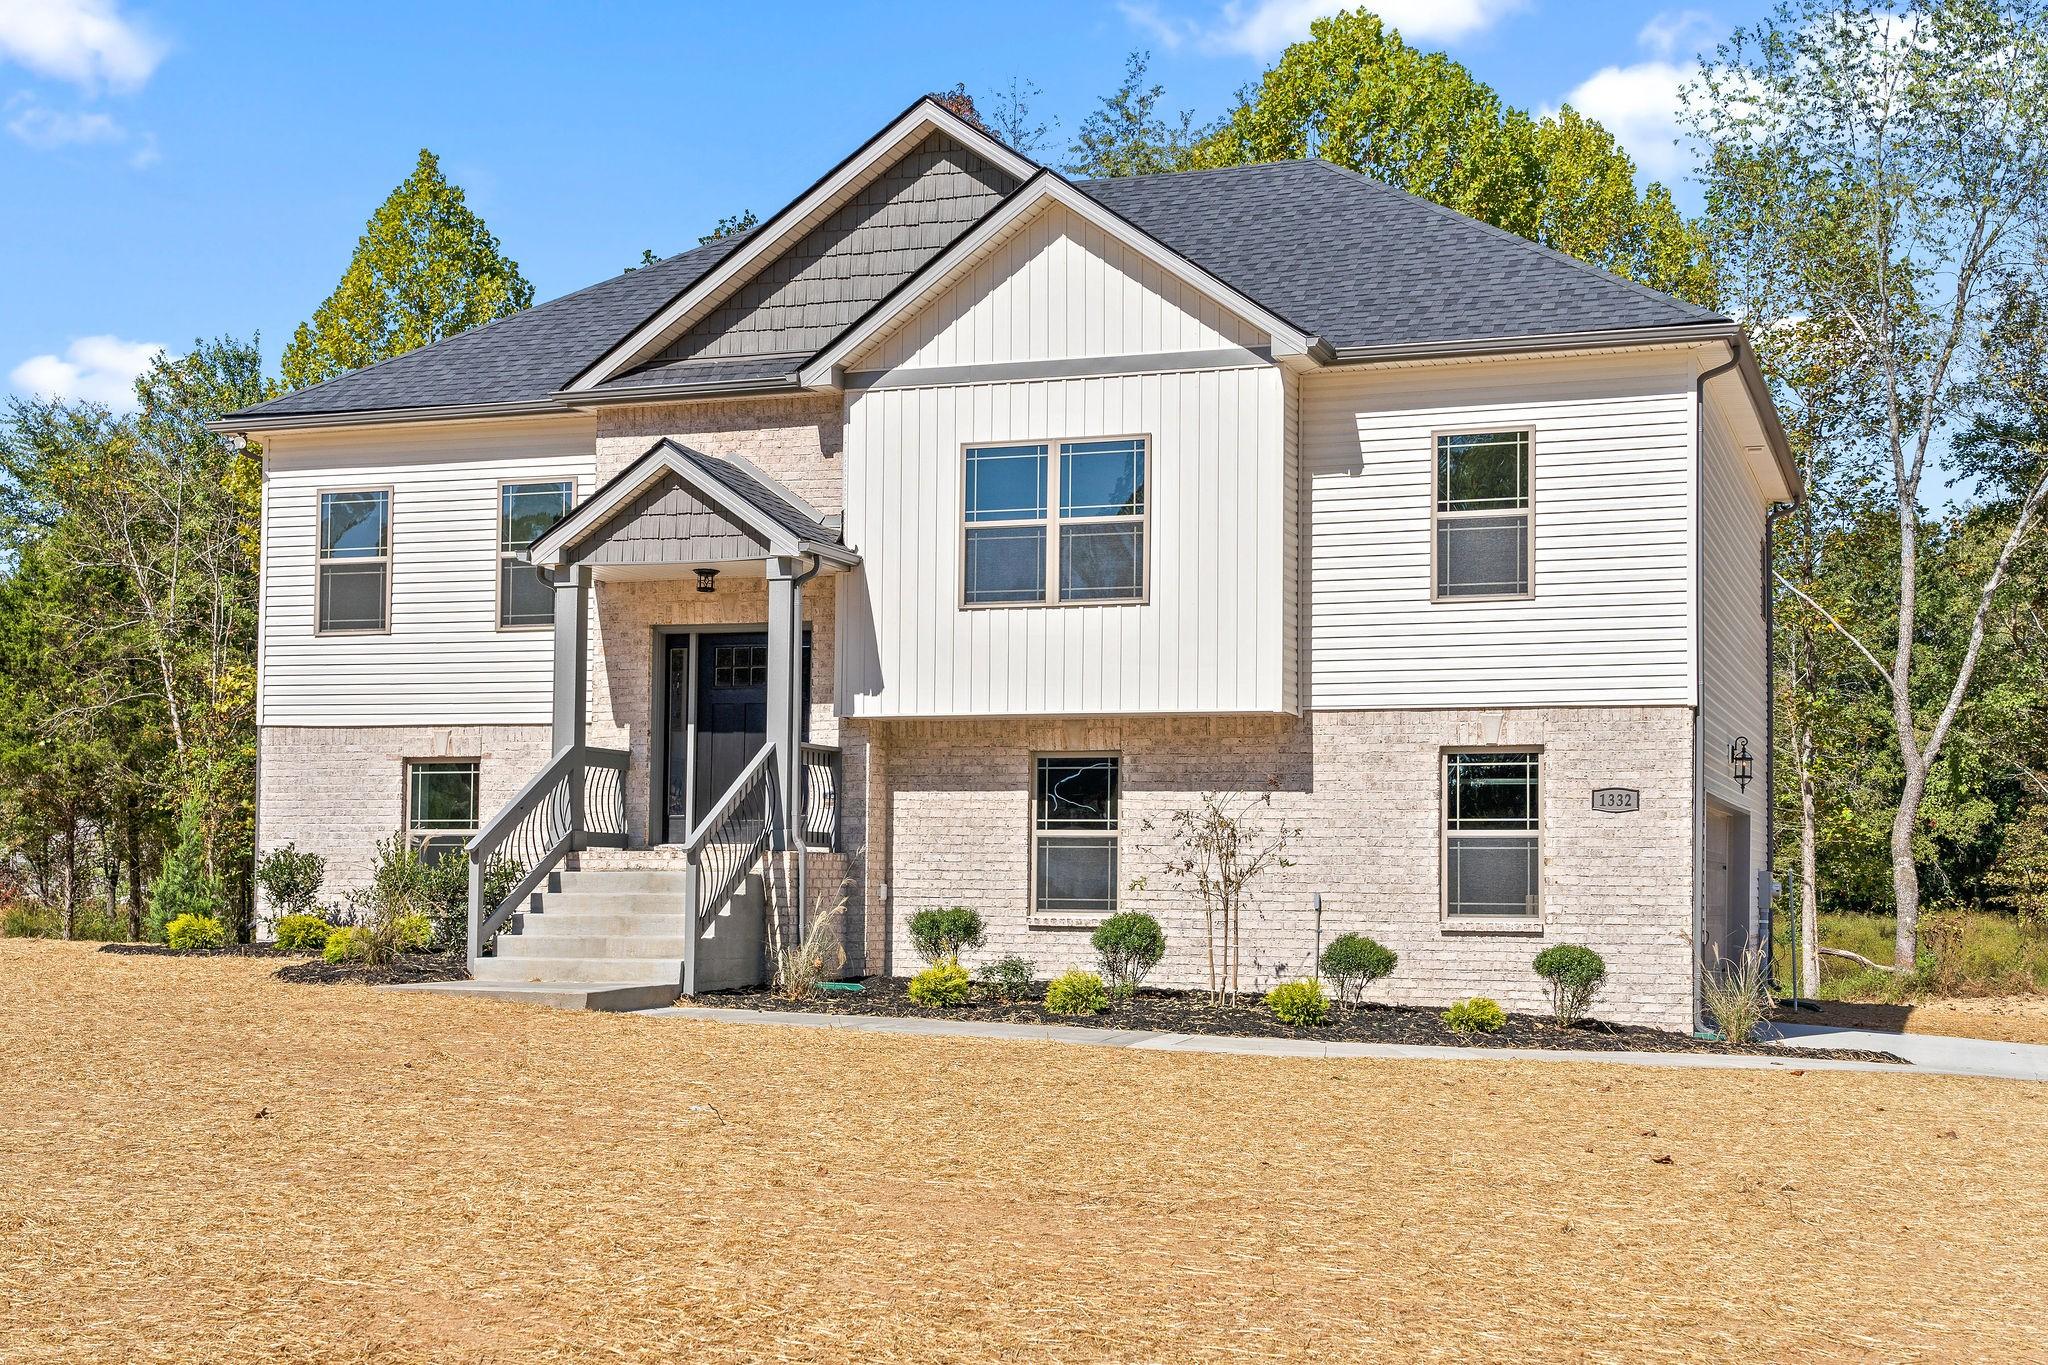 4B Booth Estates Property Photo - Woodlawn, TN real estate listing